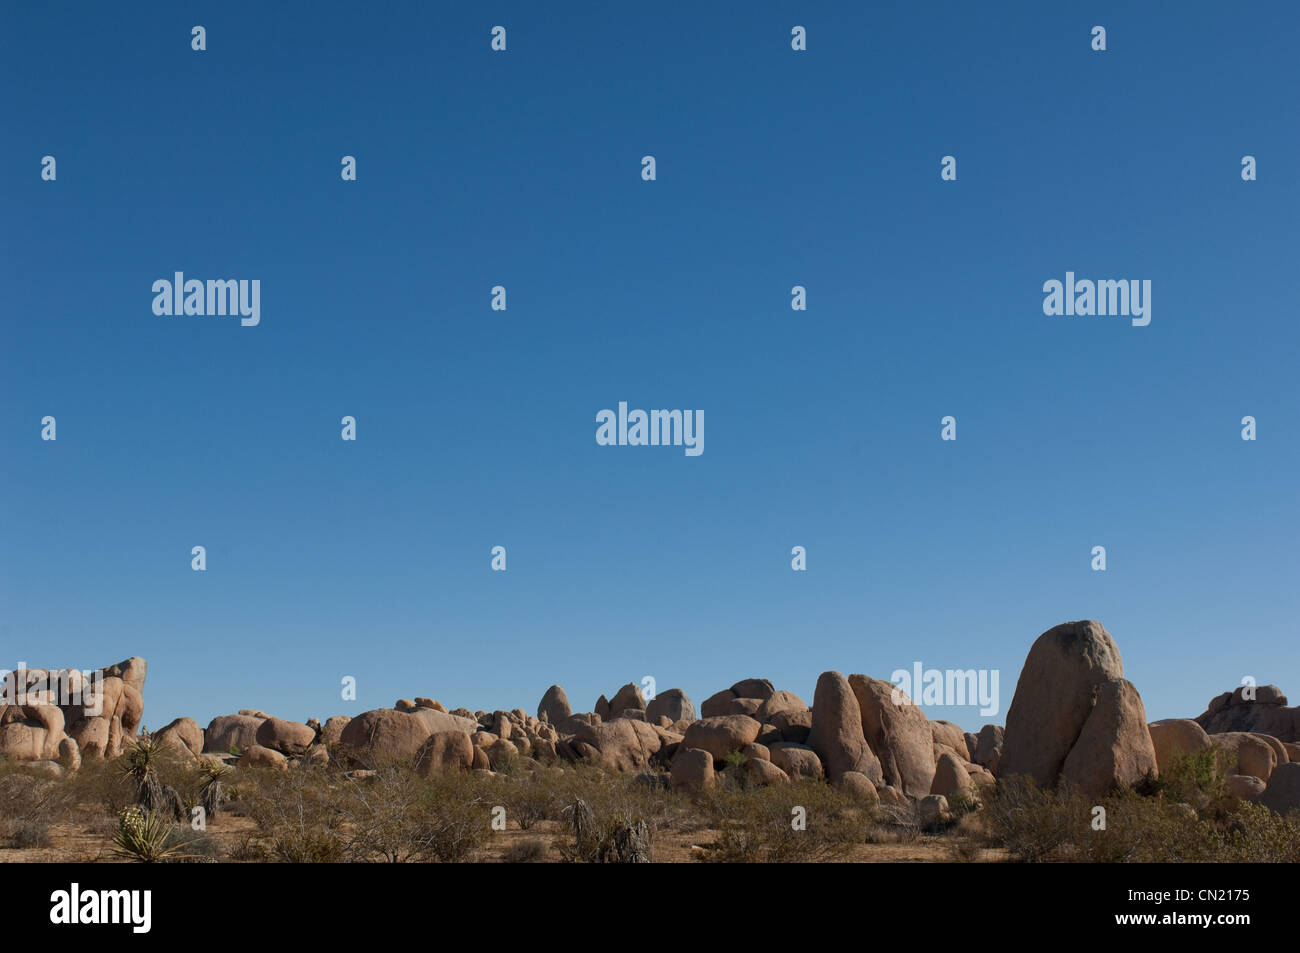 Rock formation, Joshua Tree National Park, Mojave Desert, California, USA - Stock Image